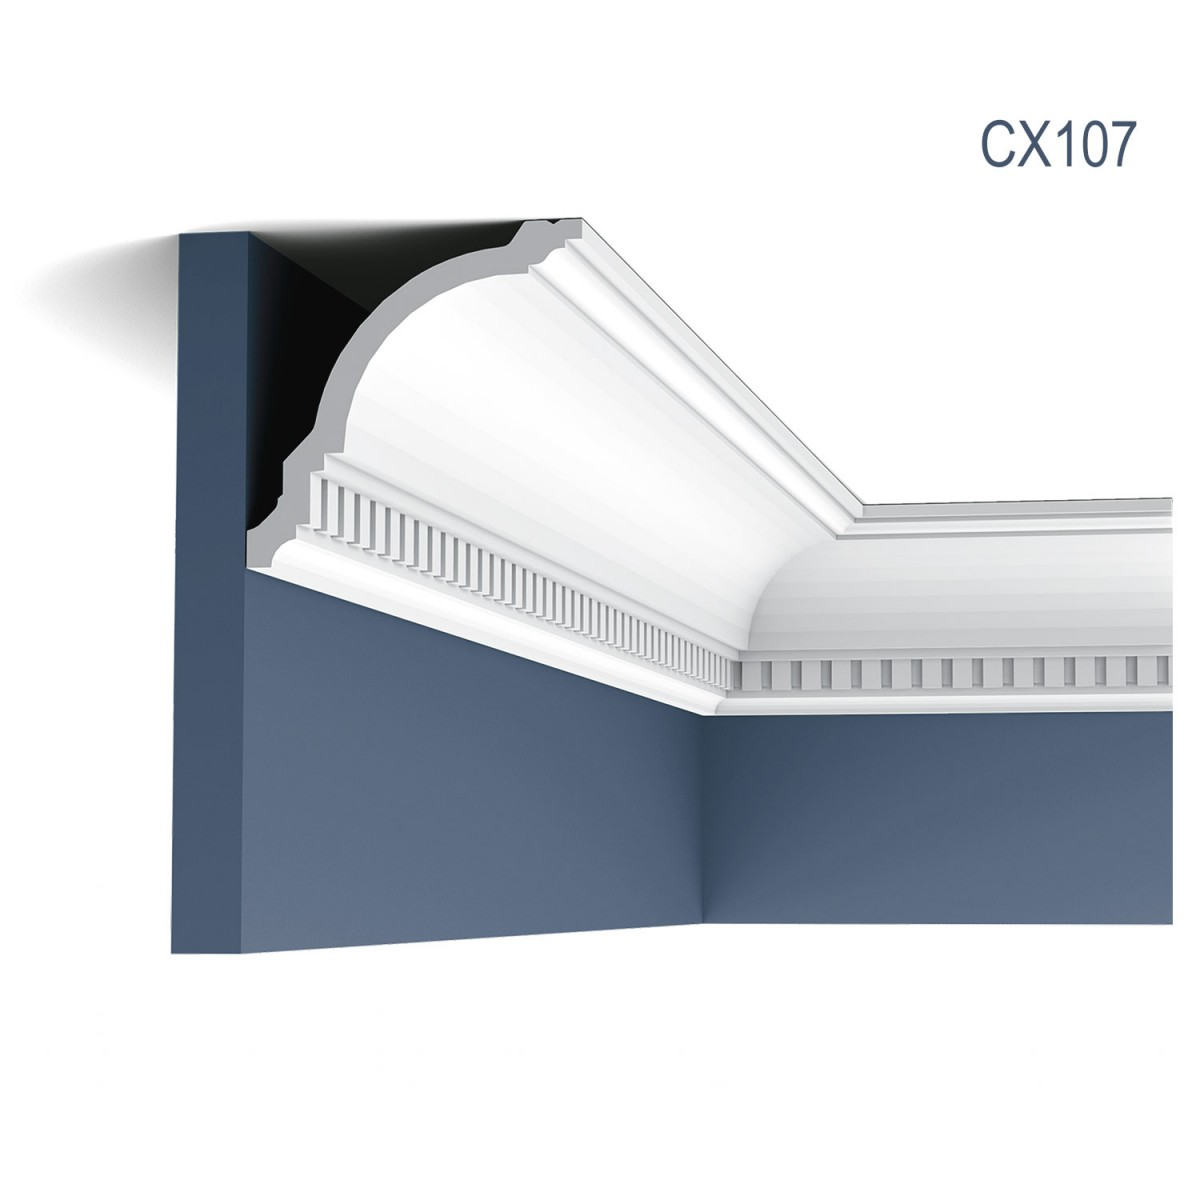 Cornisa Axxent CX107, Dimensiuni: 200 X 11.8 X 11.7 cm, Orac Decor